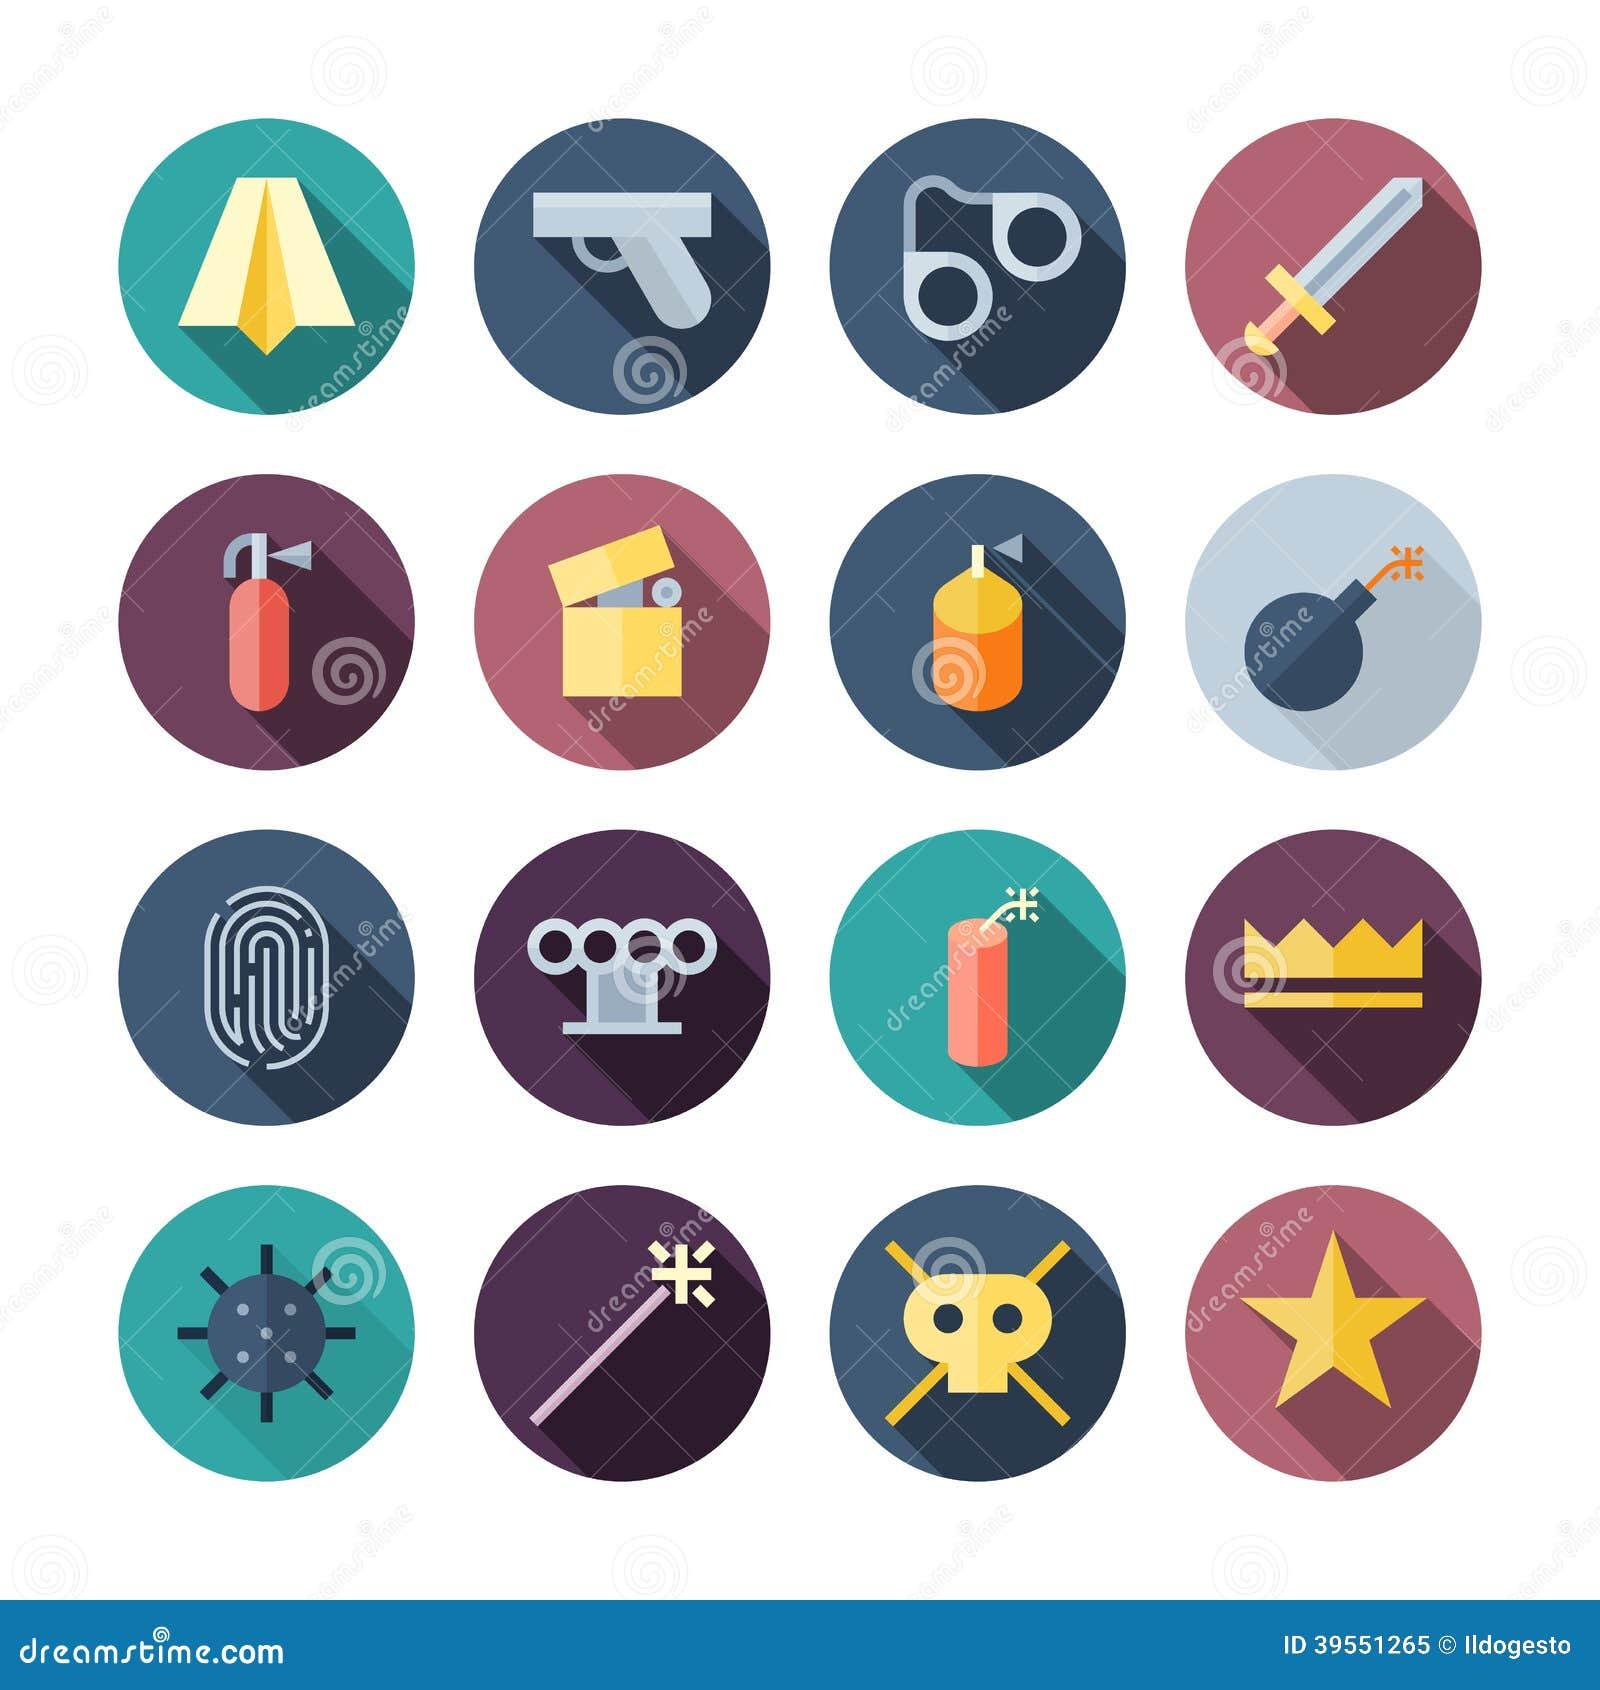 Flat Design Miscellaneous Icons